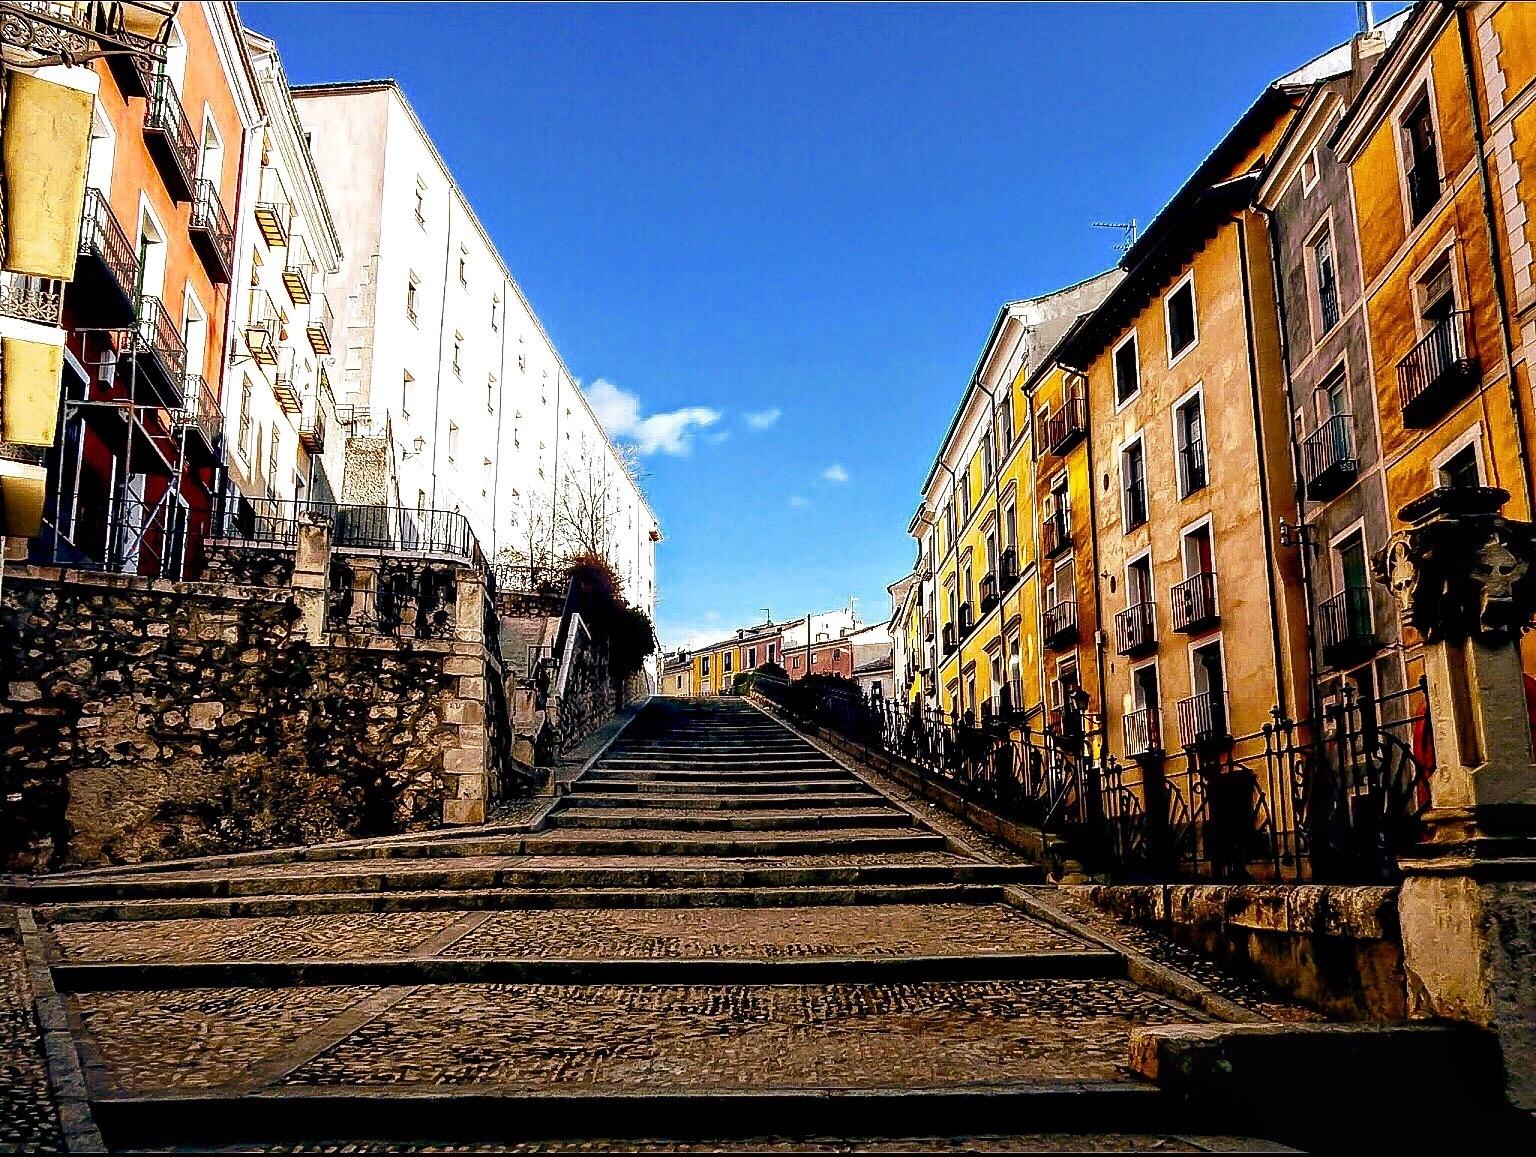 Stairway by Gregorio Emper